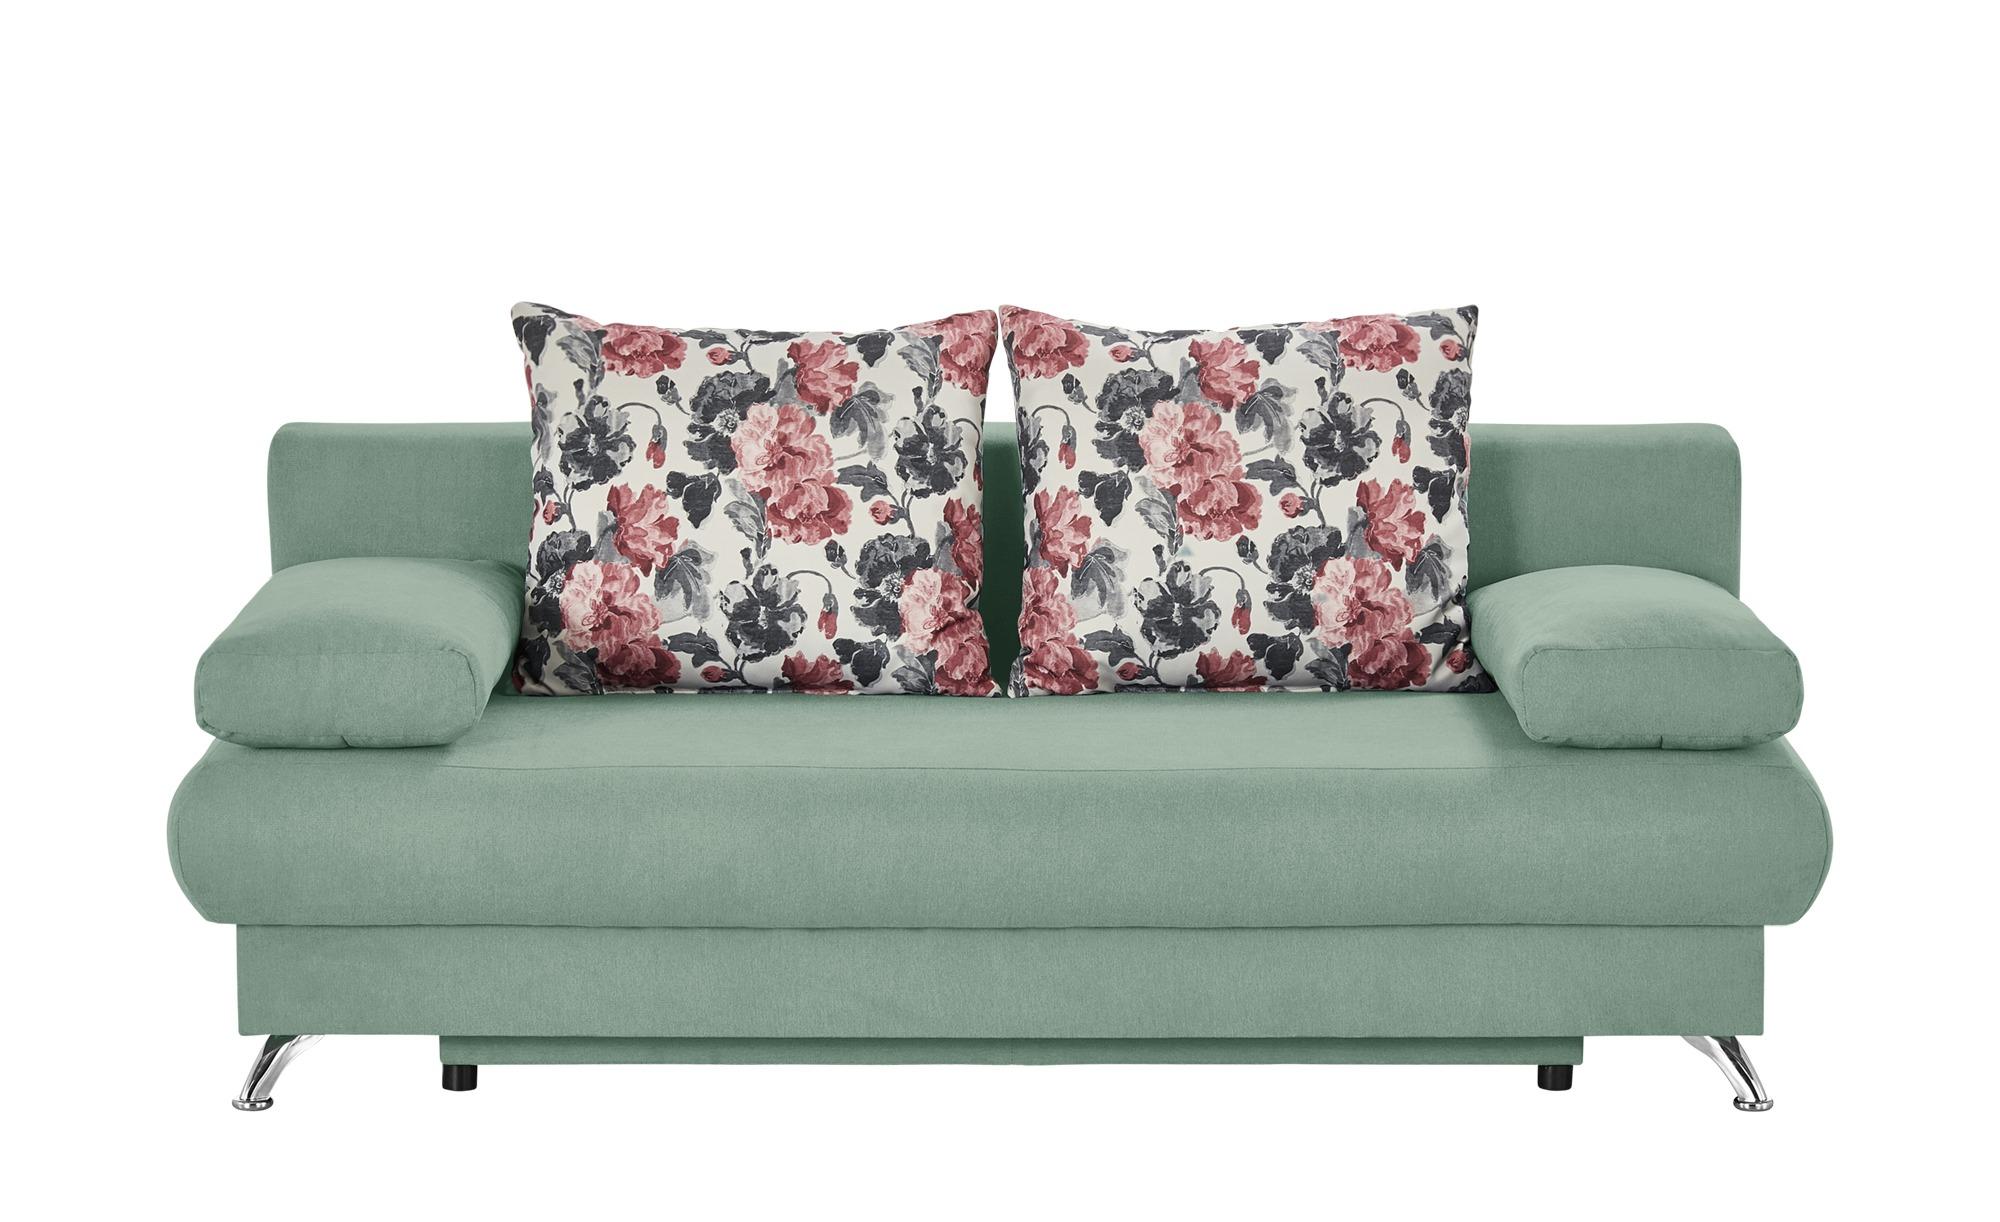 Schlafsofa mintgrün - Flachgewebe Viola ¦ grün ¦ Maße (cm): B: 203 H: 72 T: 93 Polstermöbel > Sofas > 2-Sitzer - Höffner